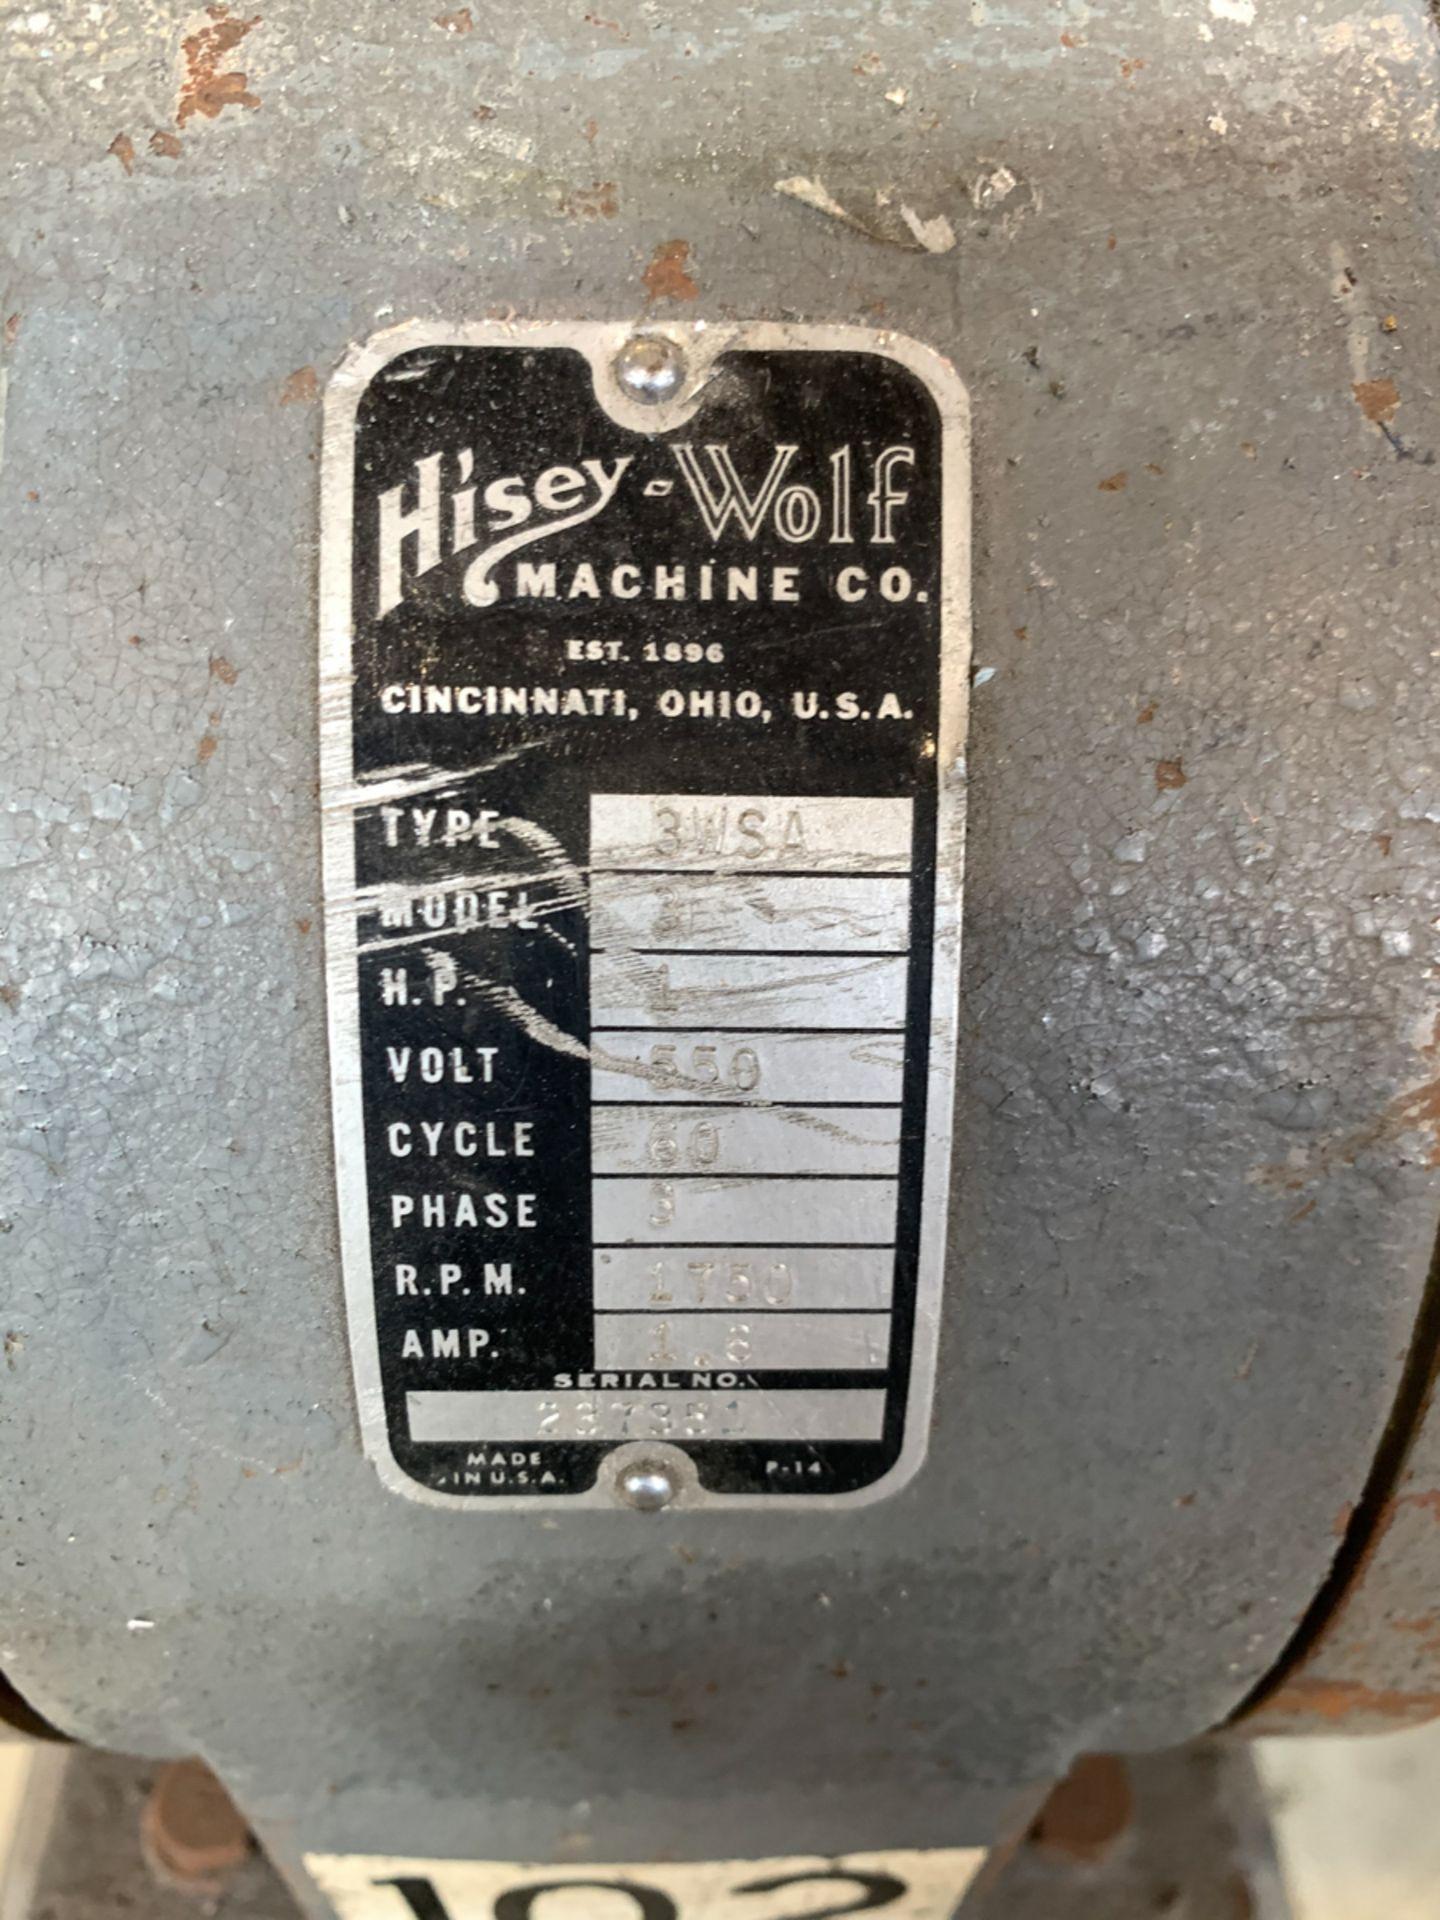 "HISEY-WOLF PEDESTAL GRINDER MOD. 3, 8"" WHEELS, 1 HP, 550 VOLTS - Image 2 of 2"